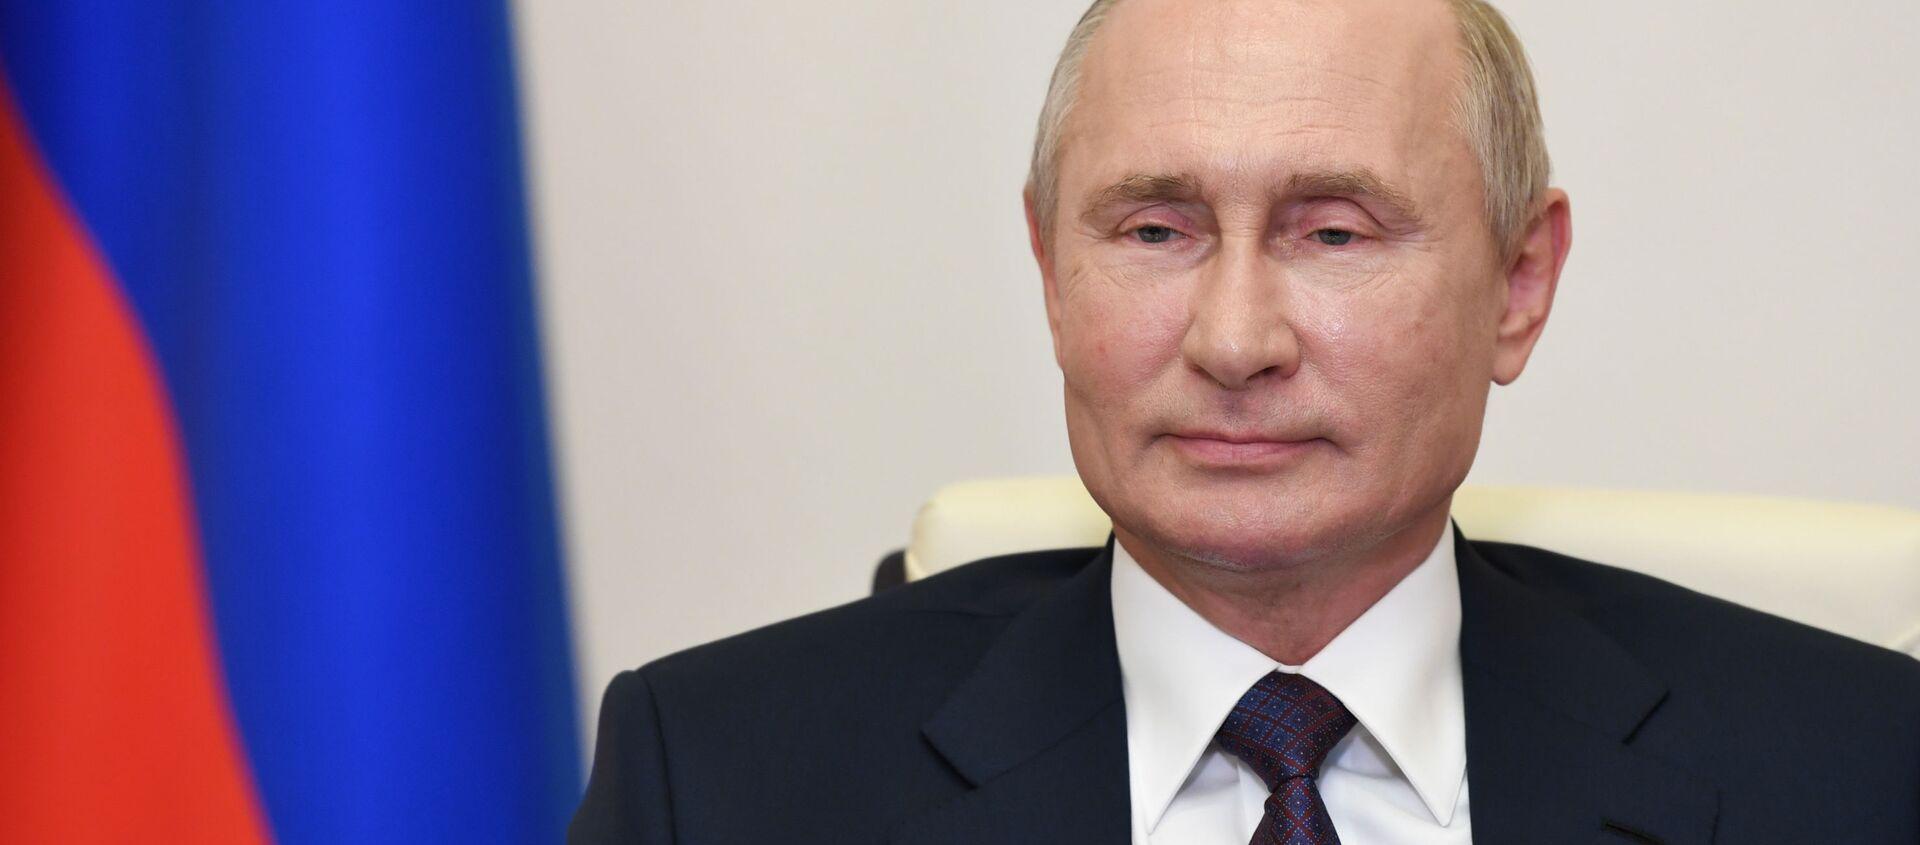 Vladimir Putin - Sputnik Việt Nam, 1920, 24.09.2020